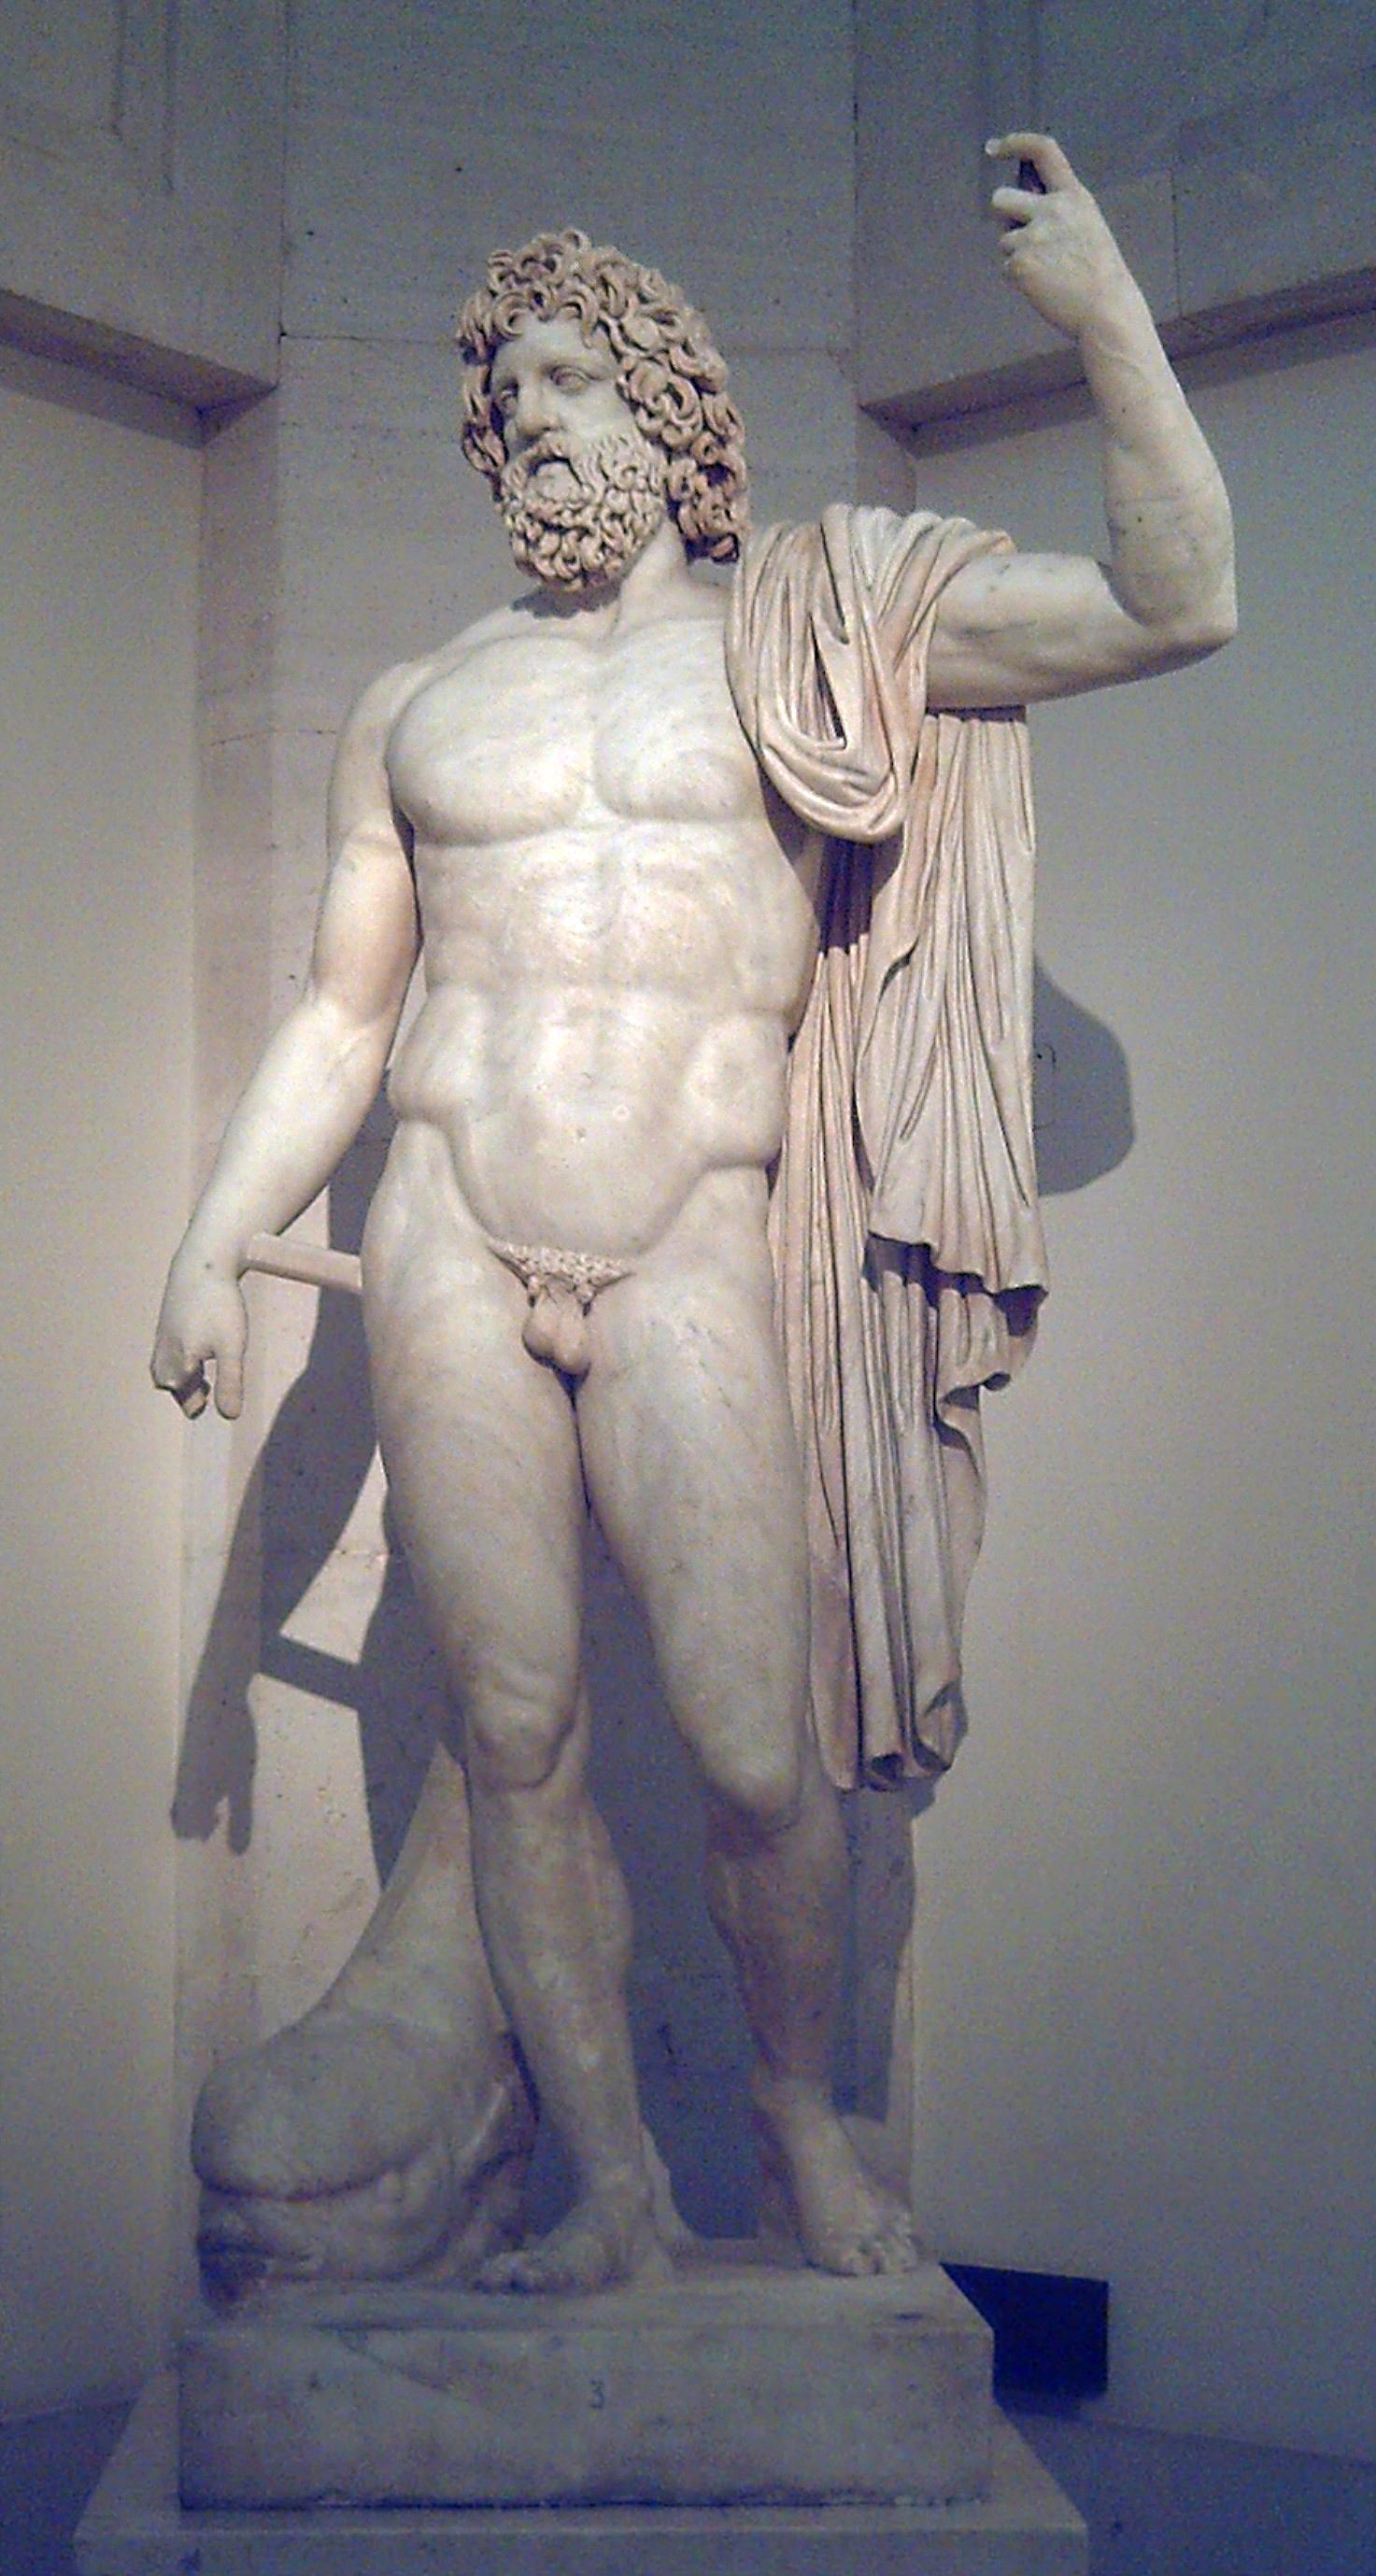 Статуя Нептуна в музее Прадо, Мадрид